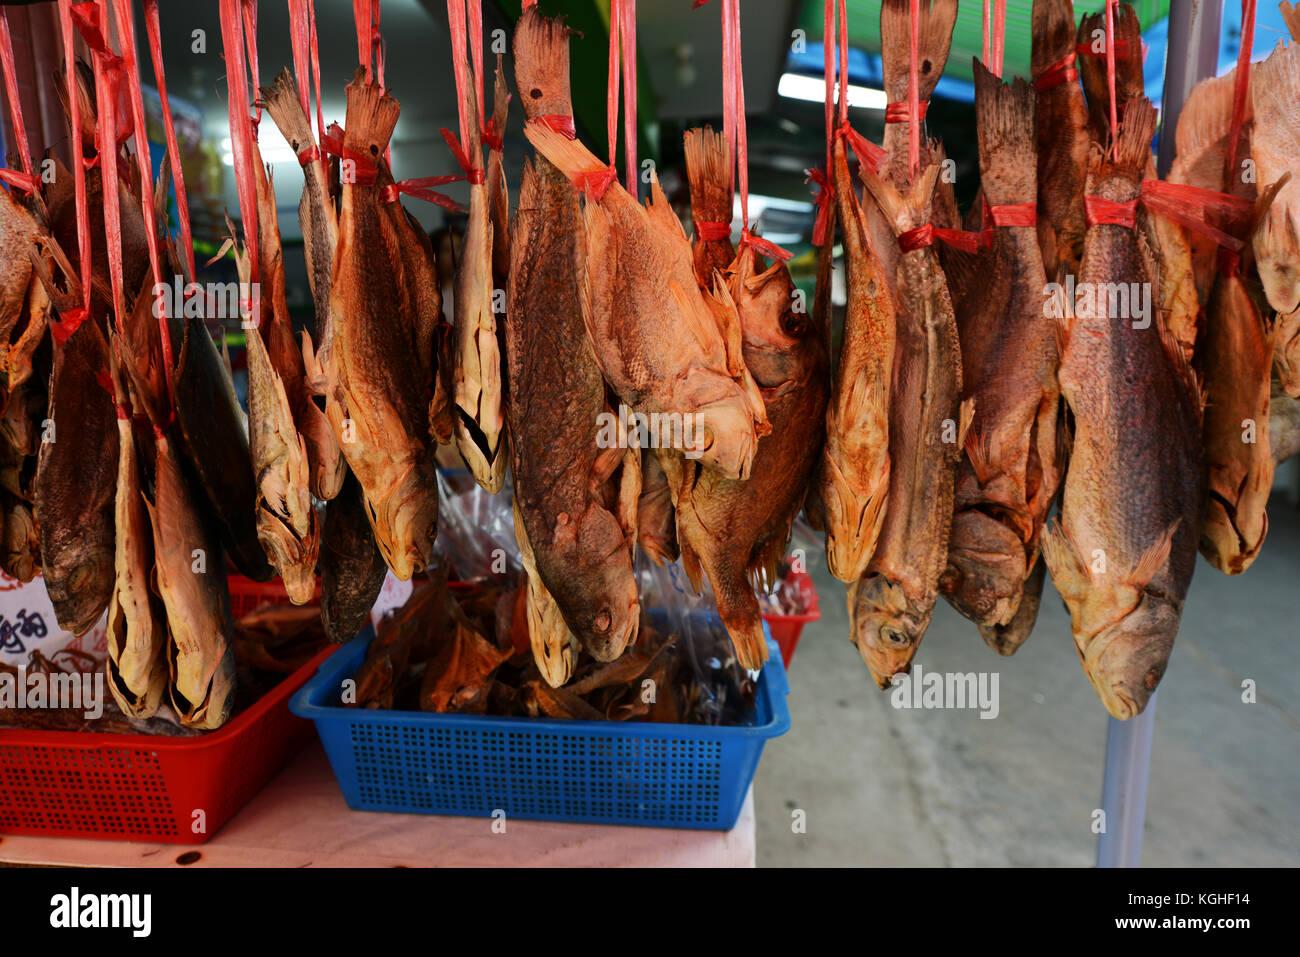 Dried fish on sale. Sok Kwu Wan village on Lamma island, Hong Kong. - Stock Image